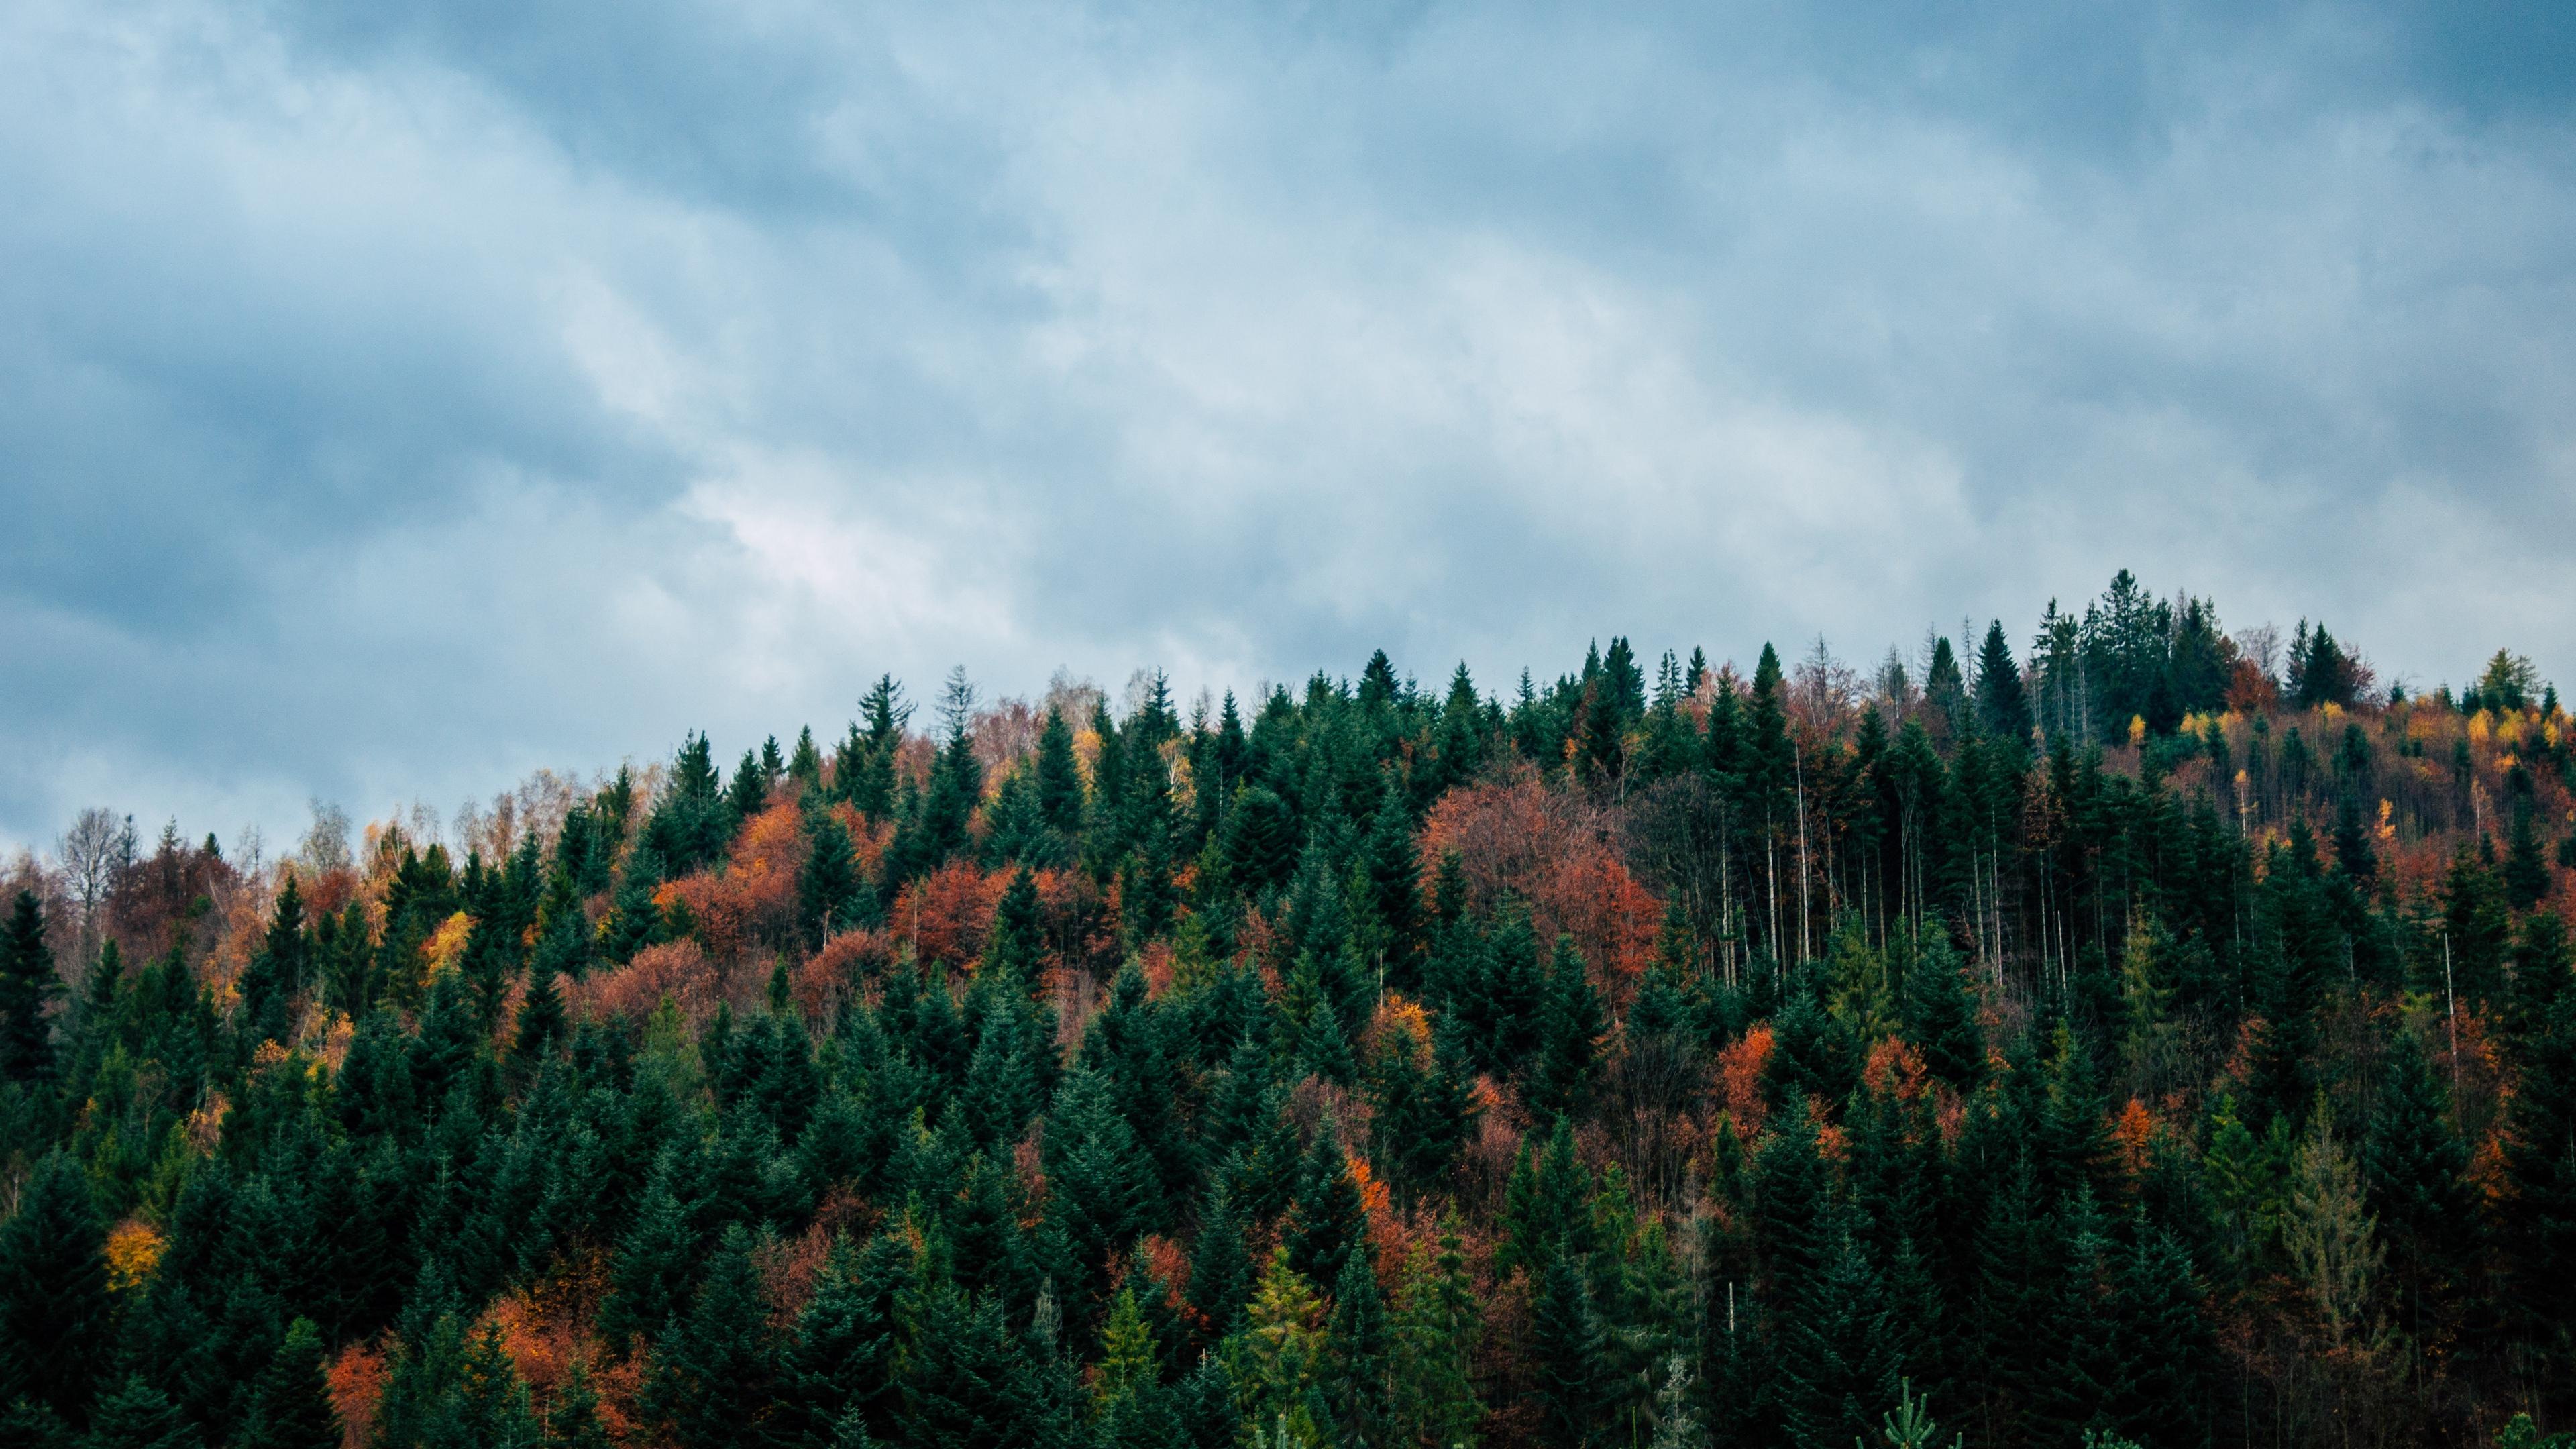 trees sky autumn top 4k 1541116610 - trees, sky, autumn, top 4k - Trees, Sky, Autumn